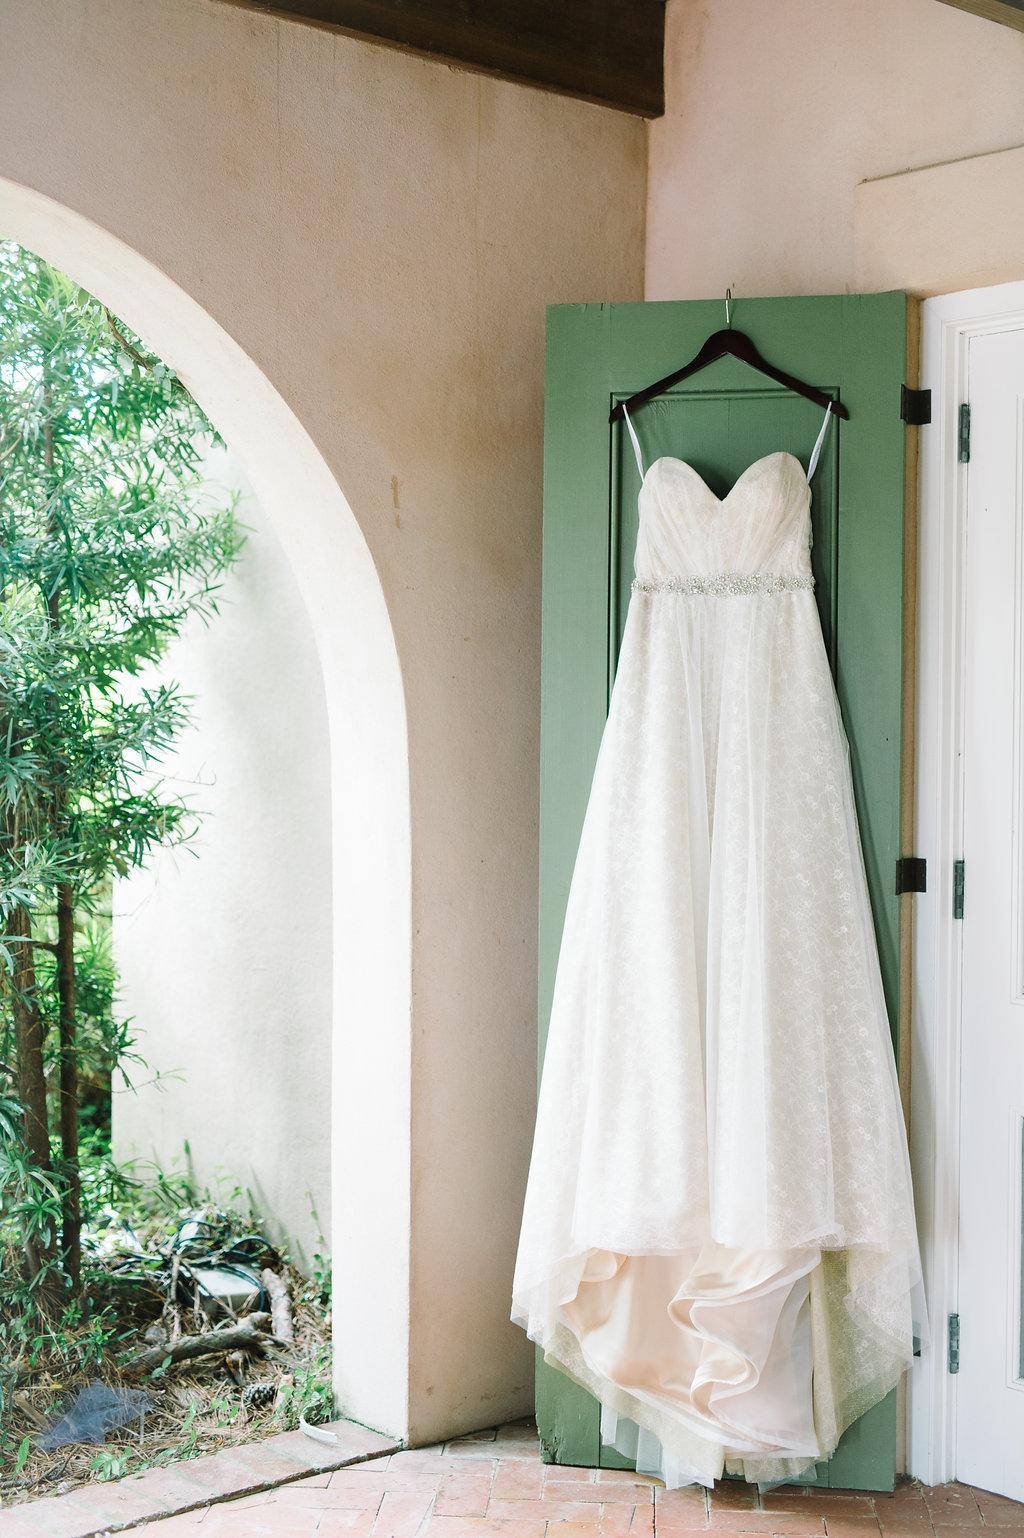 meagan-and-brenden-rach-loves-troy-photography-ivory-and-beau-bridal-boutqiue-ti-adora-wedding-dress-gold-lace-wedding-dress-savannah-wedding-planner-savannah-weddings-oldfield-plantation-wedding-savannah-florist-4.jpg